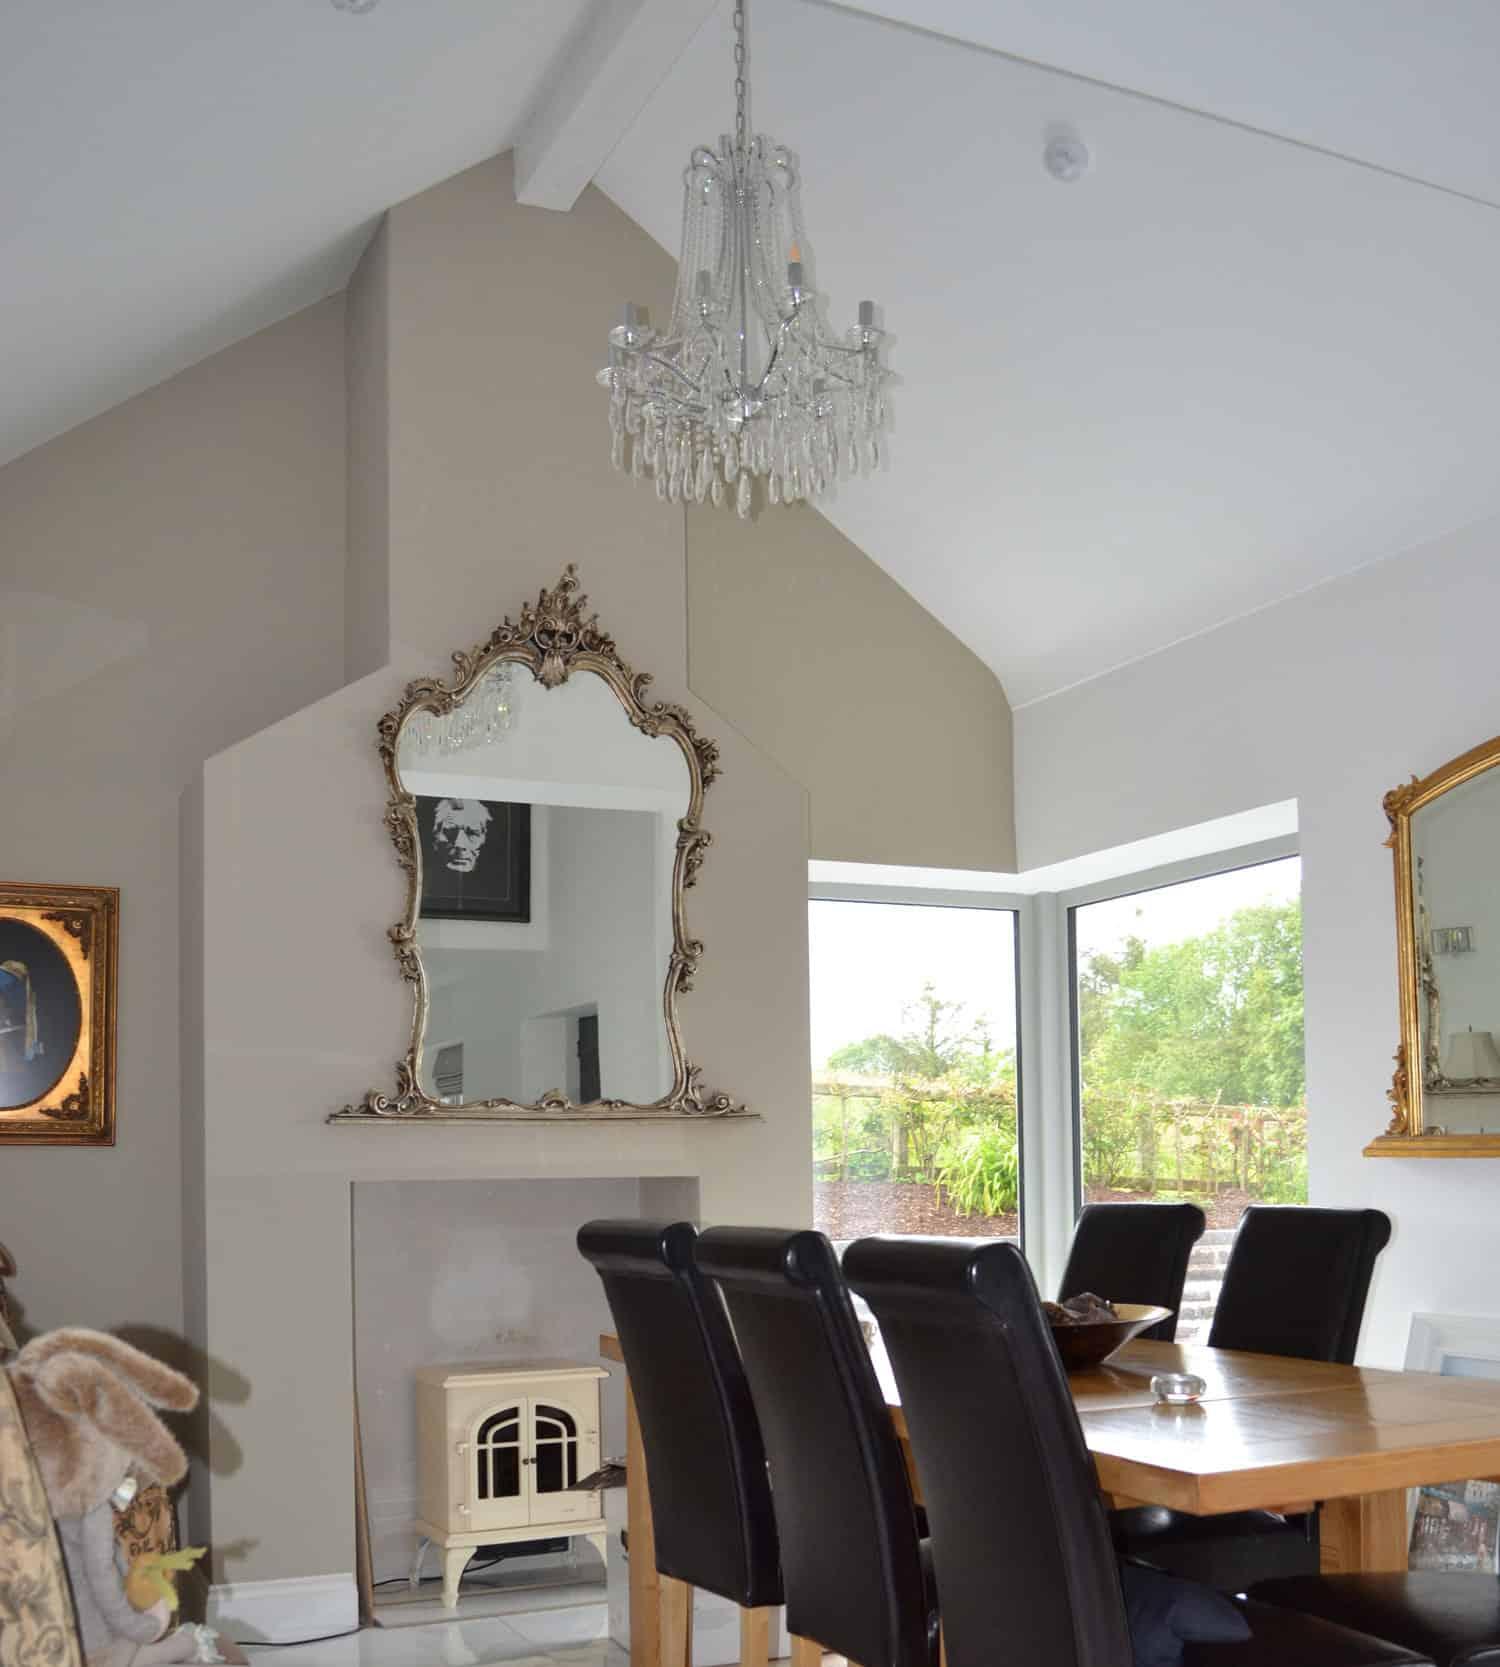 Fleming Dwelling - Snug Room With Vaulted Ceiling & Corner Window